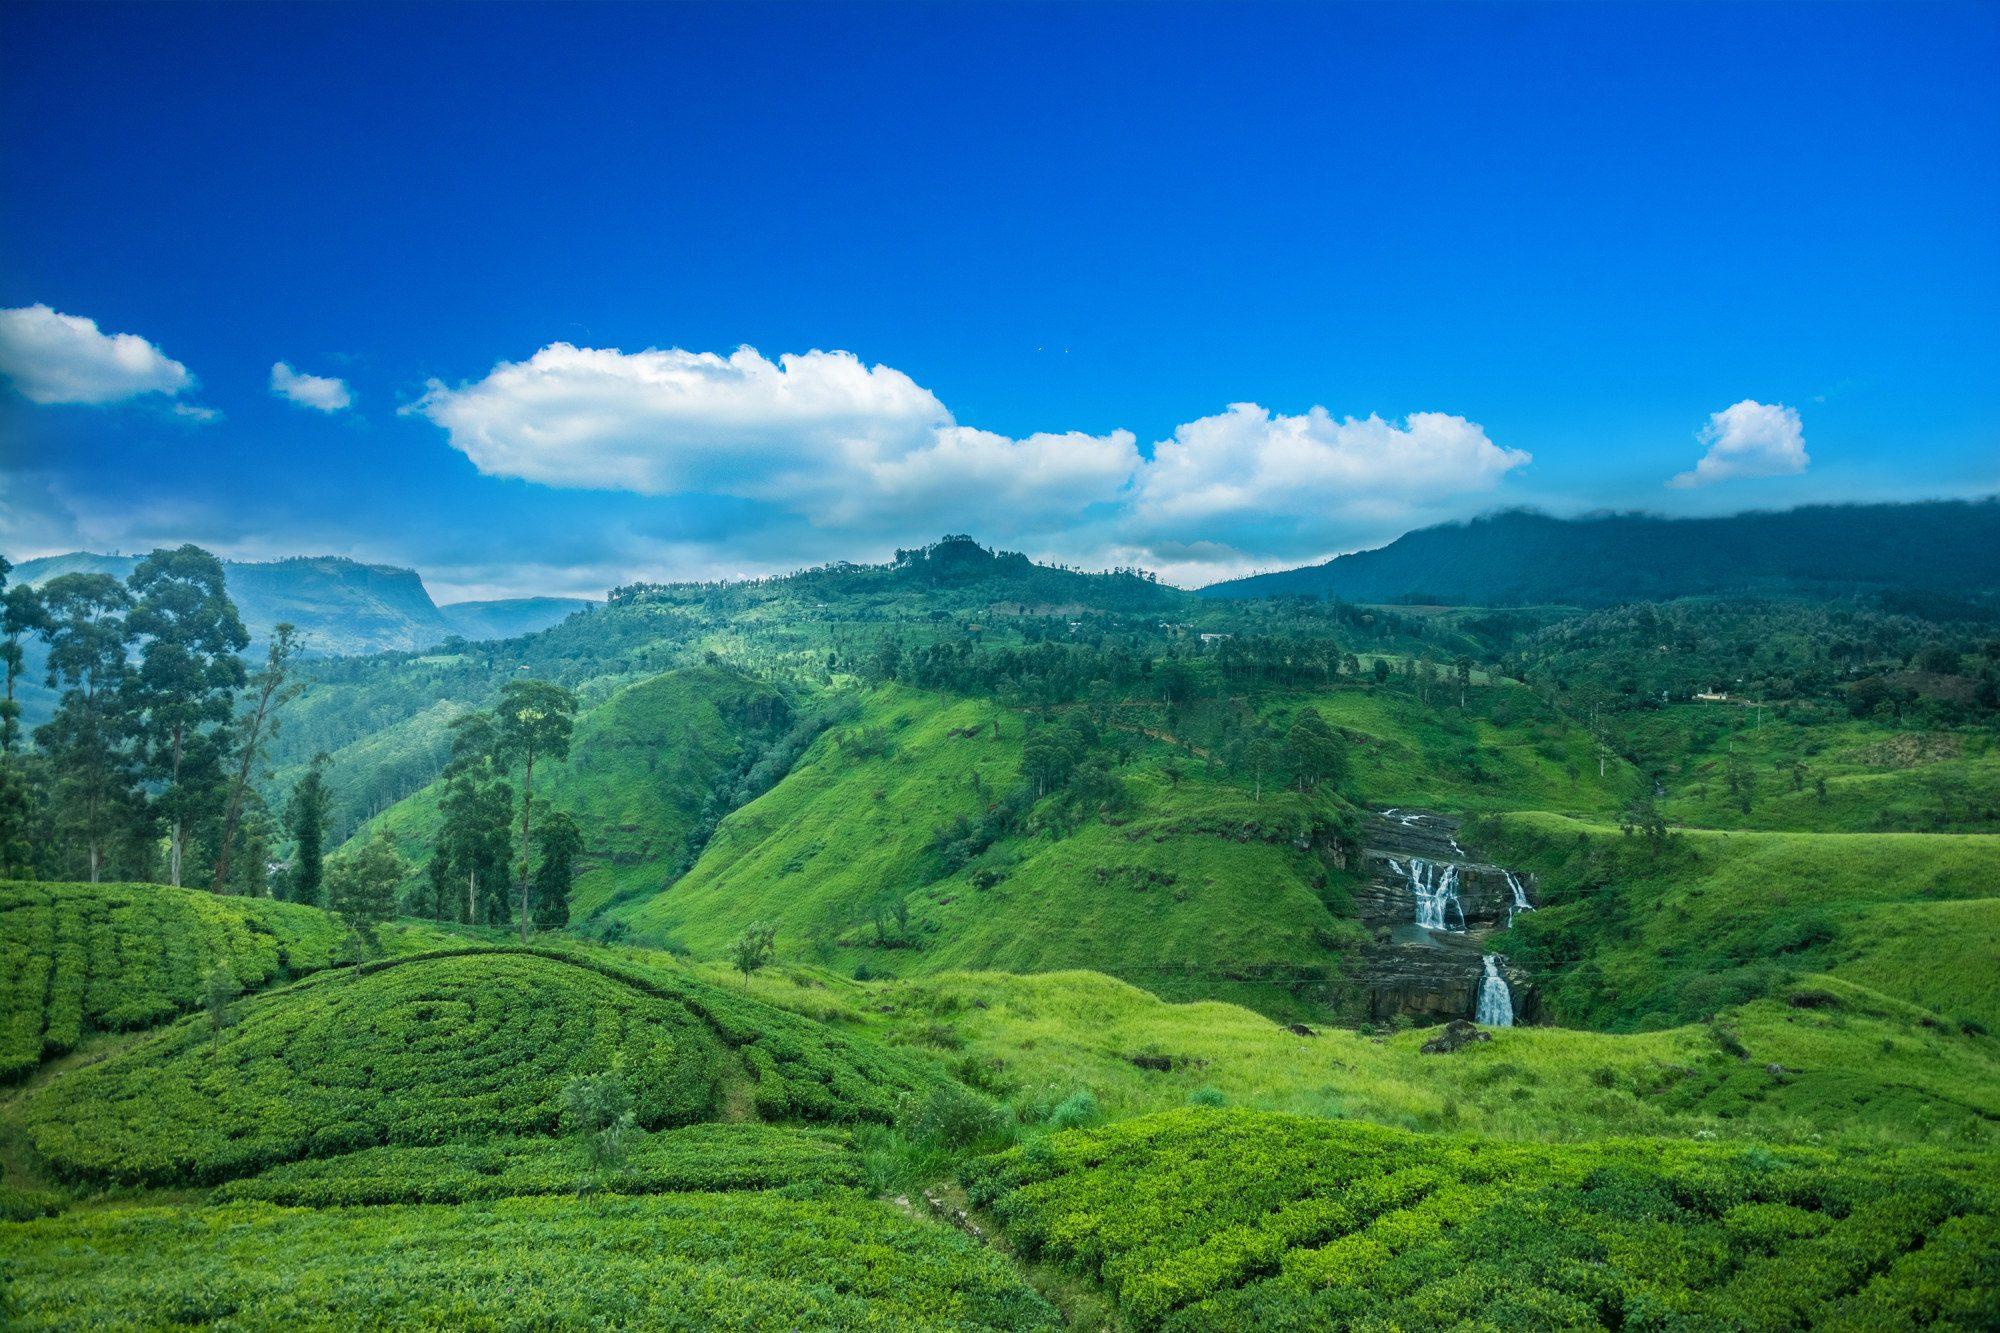 Sri Lanka Tour Packages - Sri Lanka Tour Package from